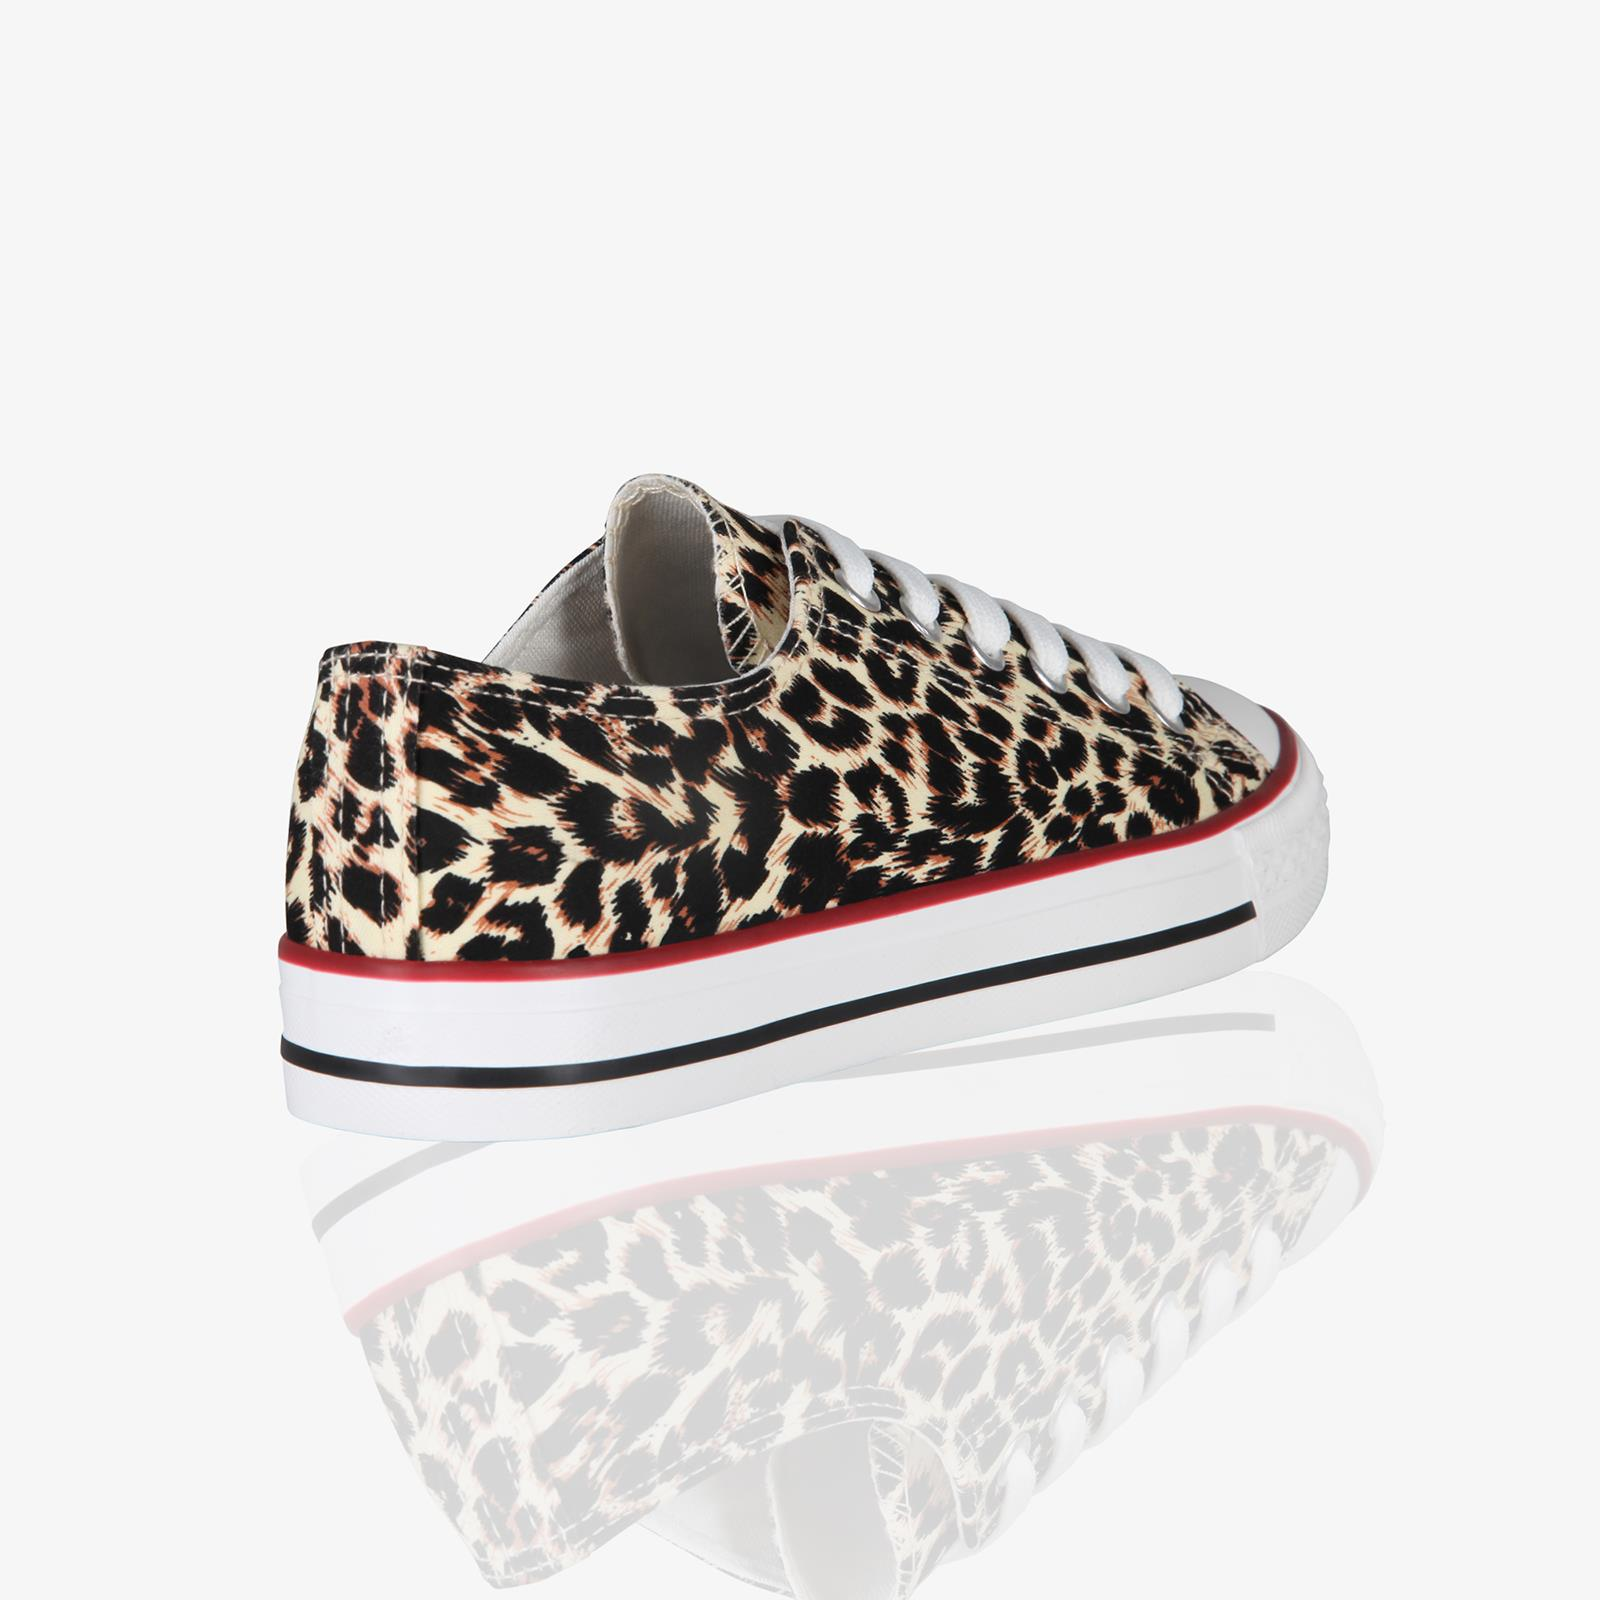 Zapatillas-Mujer-Casuales-Deportiva-Barata-Lona-Moda-Originales-Outlet-Tela-Moda miniatura 25